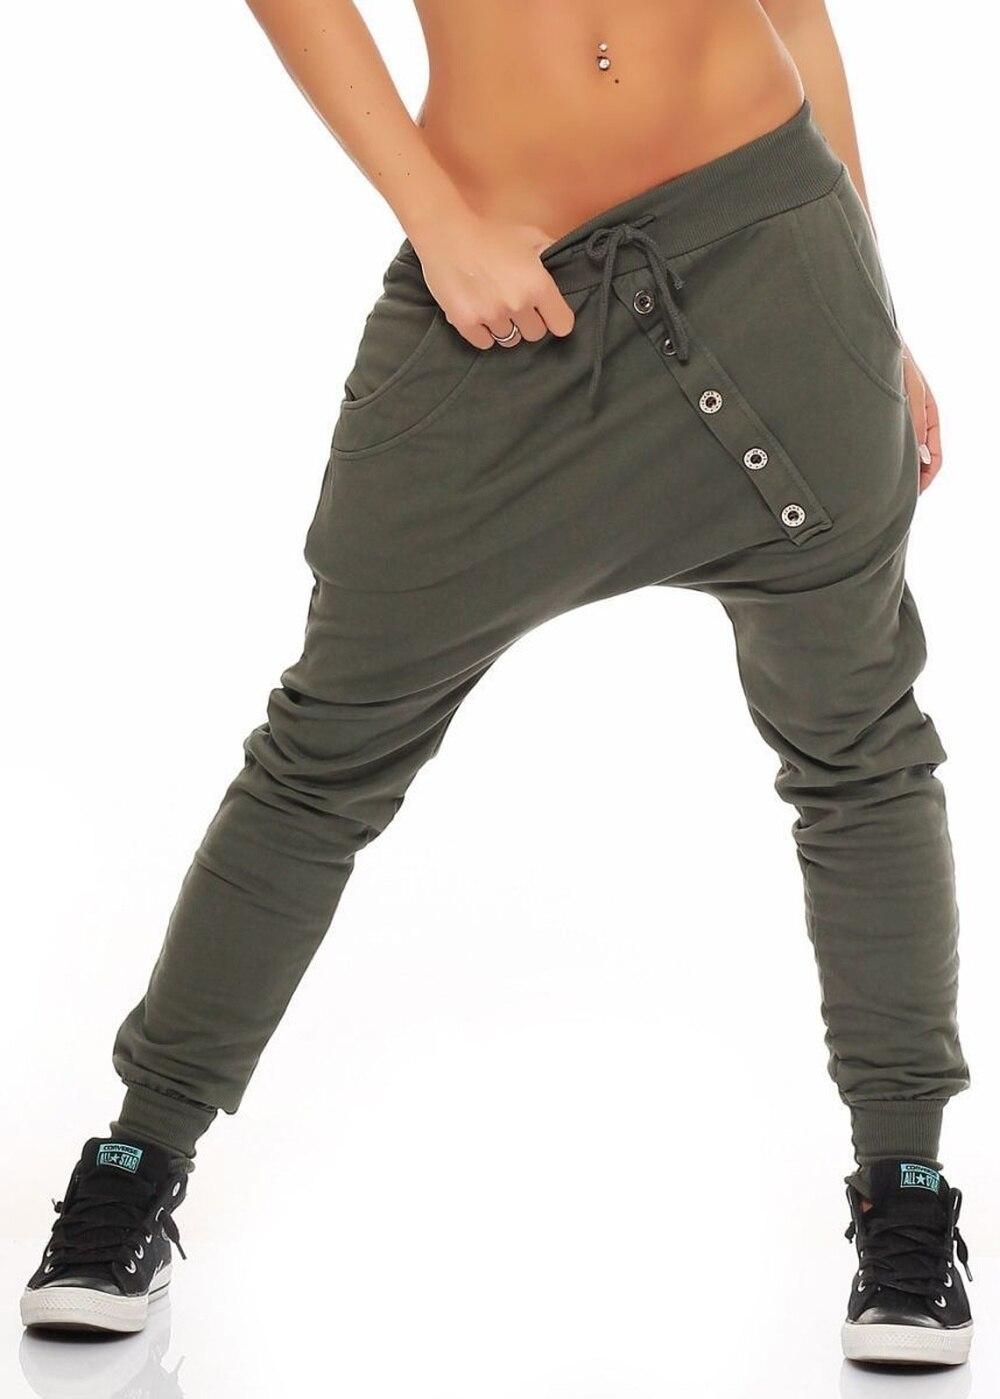 ZOGAA Plus Size S-4XL Womens Sport Pants New Fashion Full Length Harem Pants Loose Sweatpants Streetwear Women Joggers